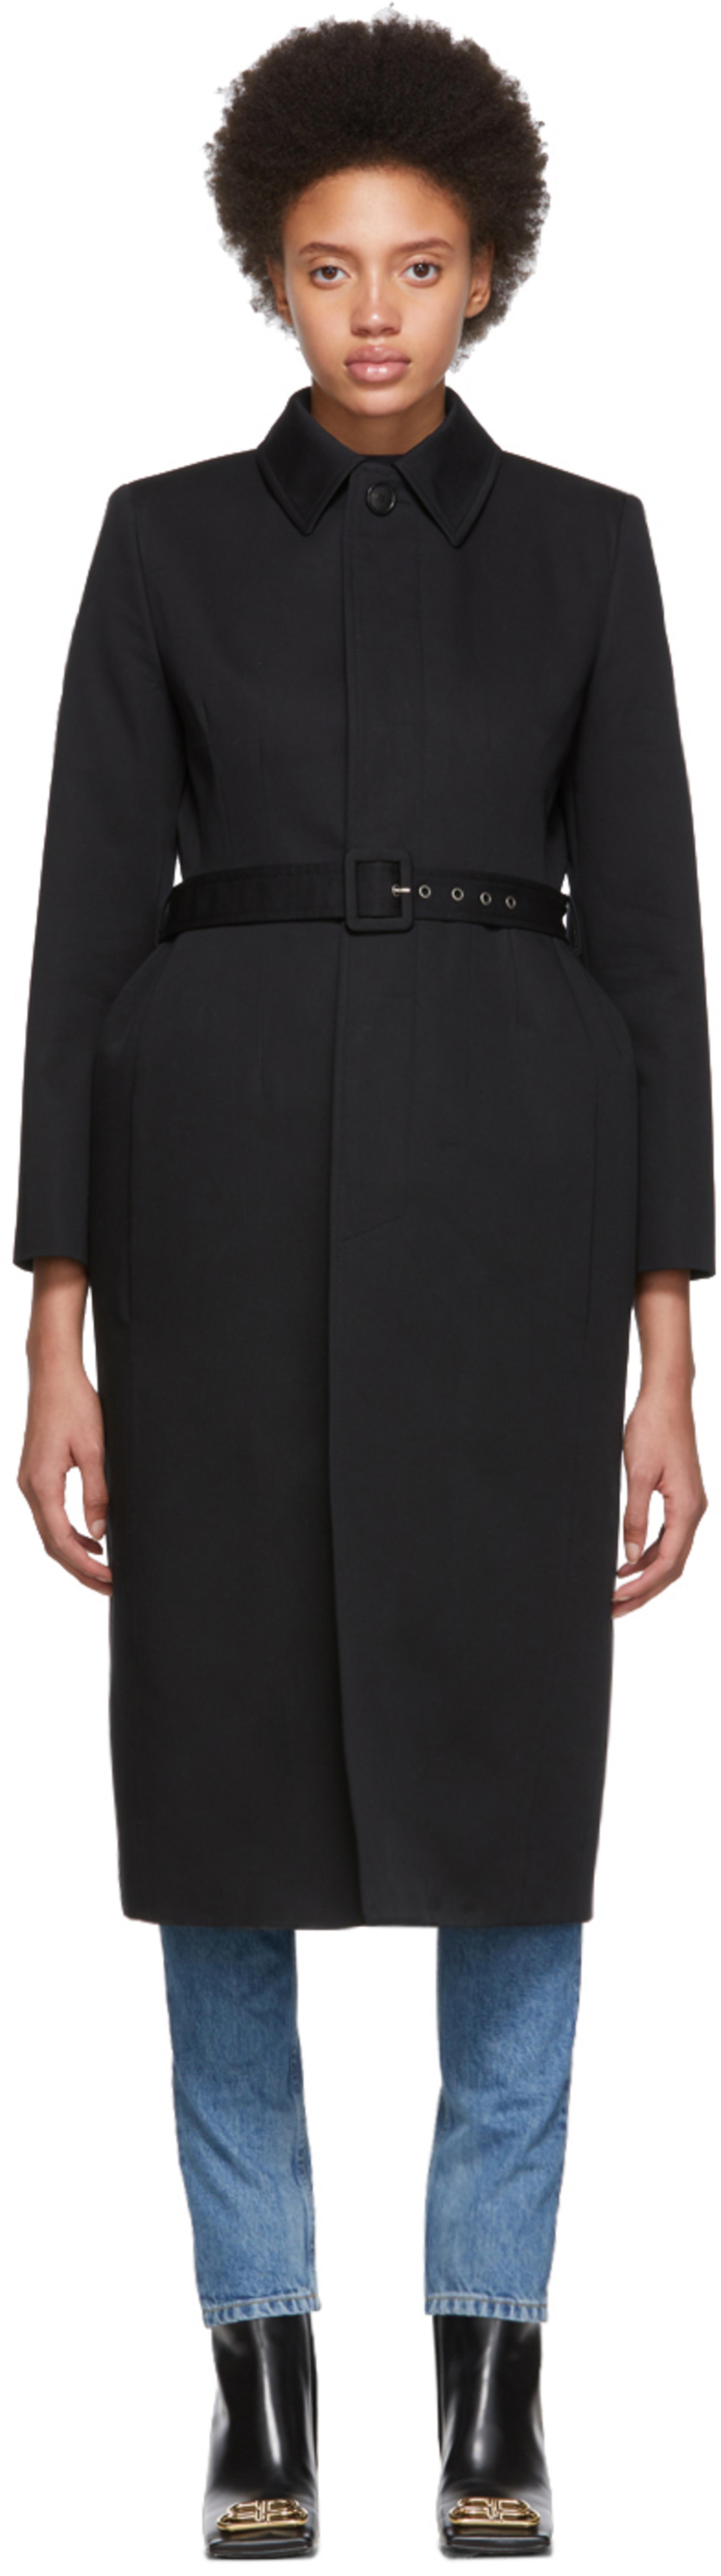 ddeaa280ea5 Designer jackets   coats for Women